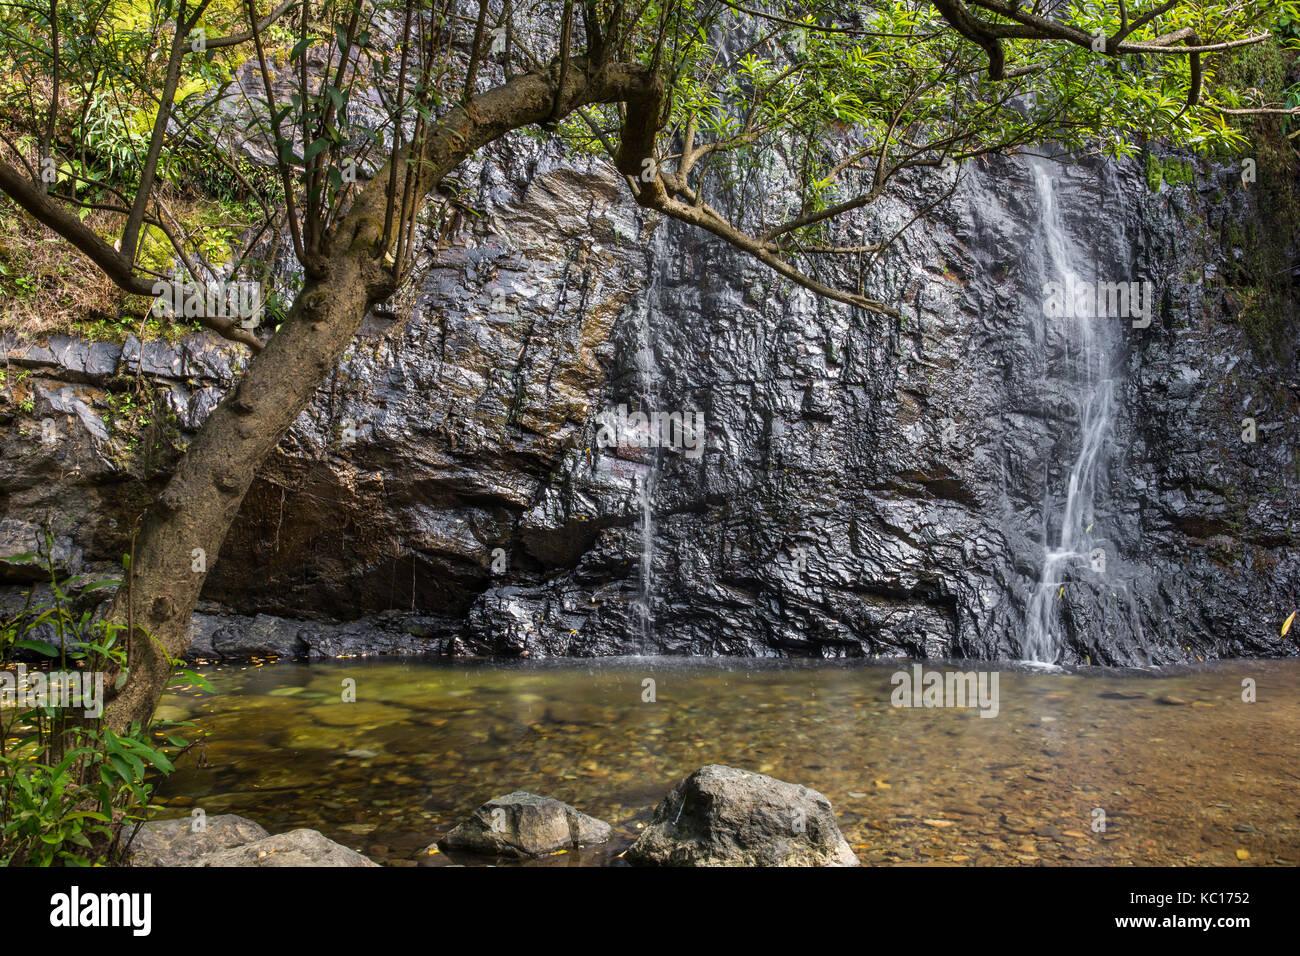 Kaeng nyui waterfall in Vang Vieng, Laos. Tropical rainforest landscape with beautiful waterfall, rocks and jungle Stock Photo